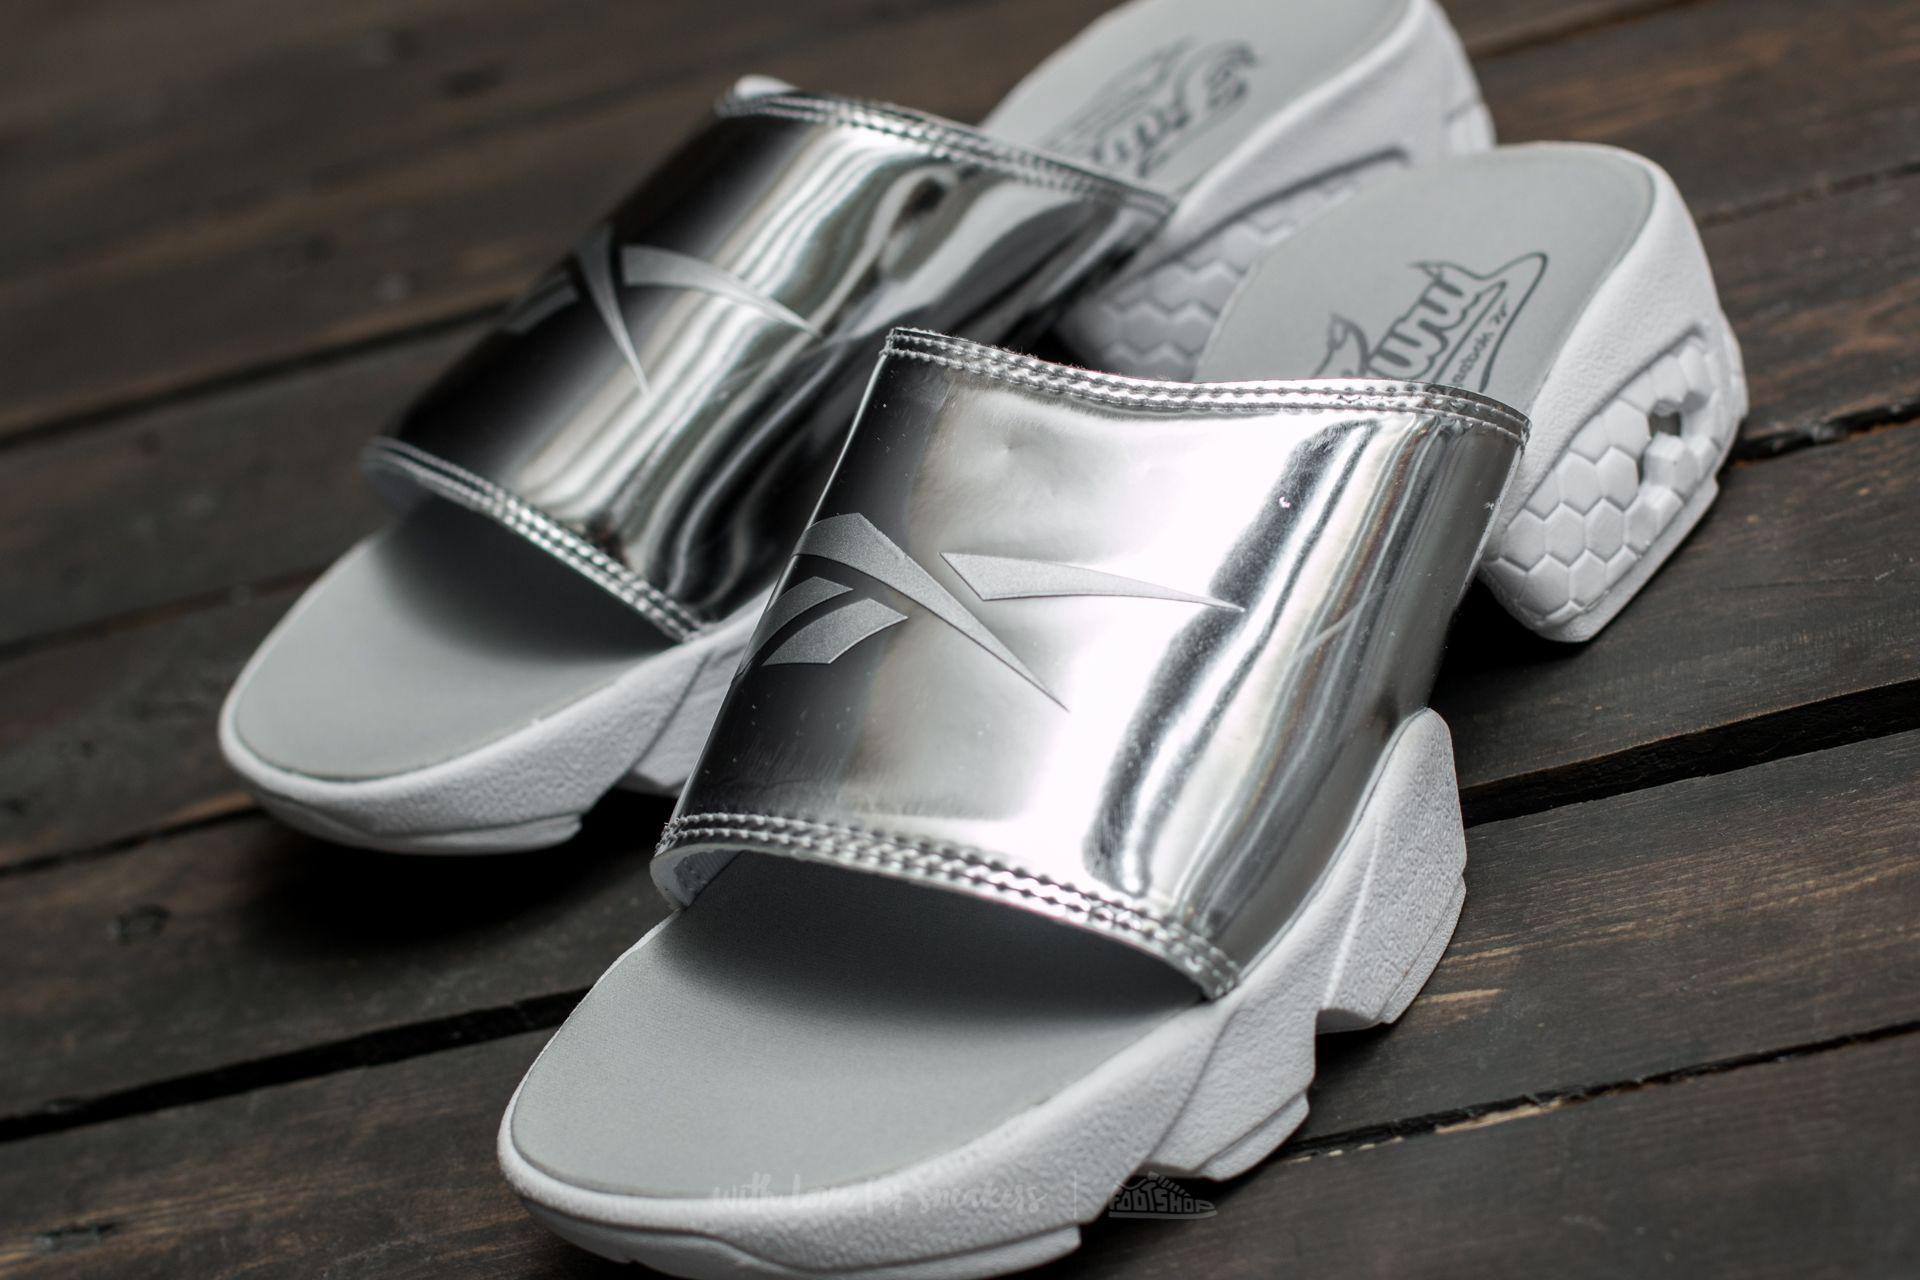 6053b7092 Lyst - Reebok Fury Slide Magic Hour Silver Metallic  White in Metallic